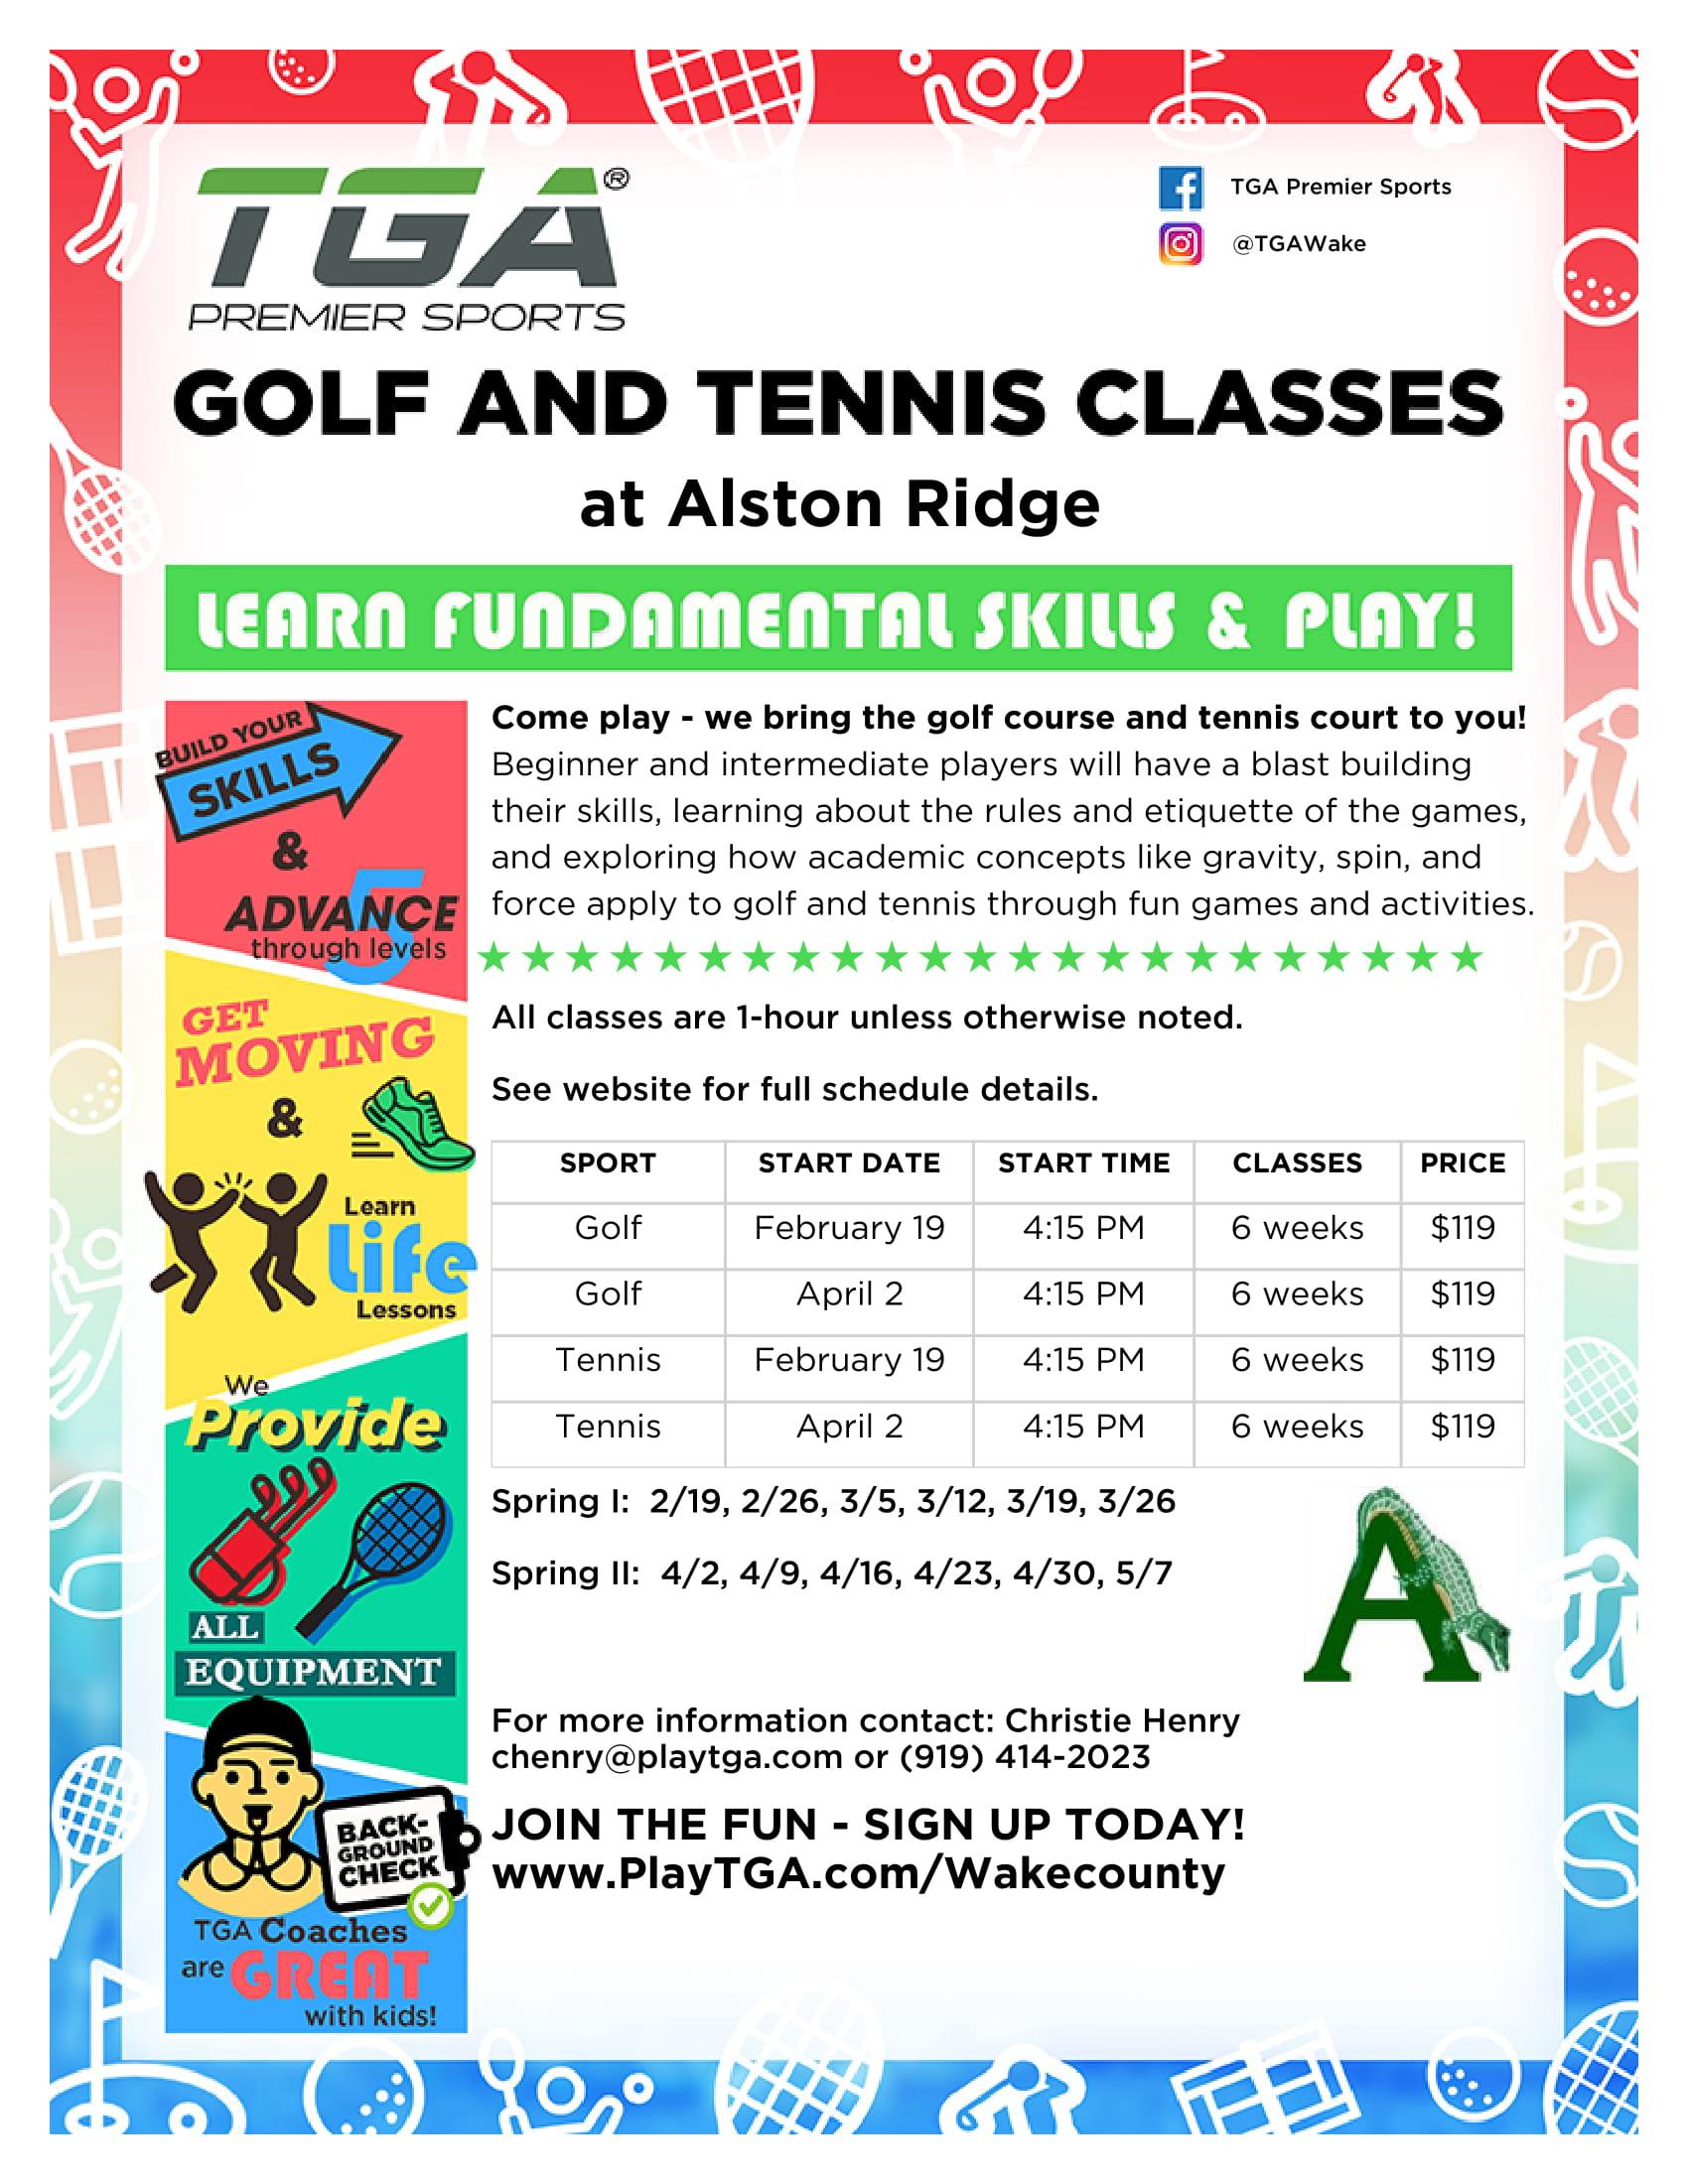 Alston Ridge Elementary Spring 2019 flyer 11-30-18-1